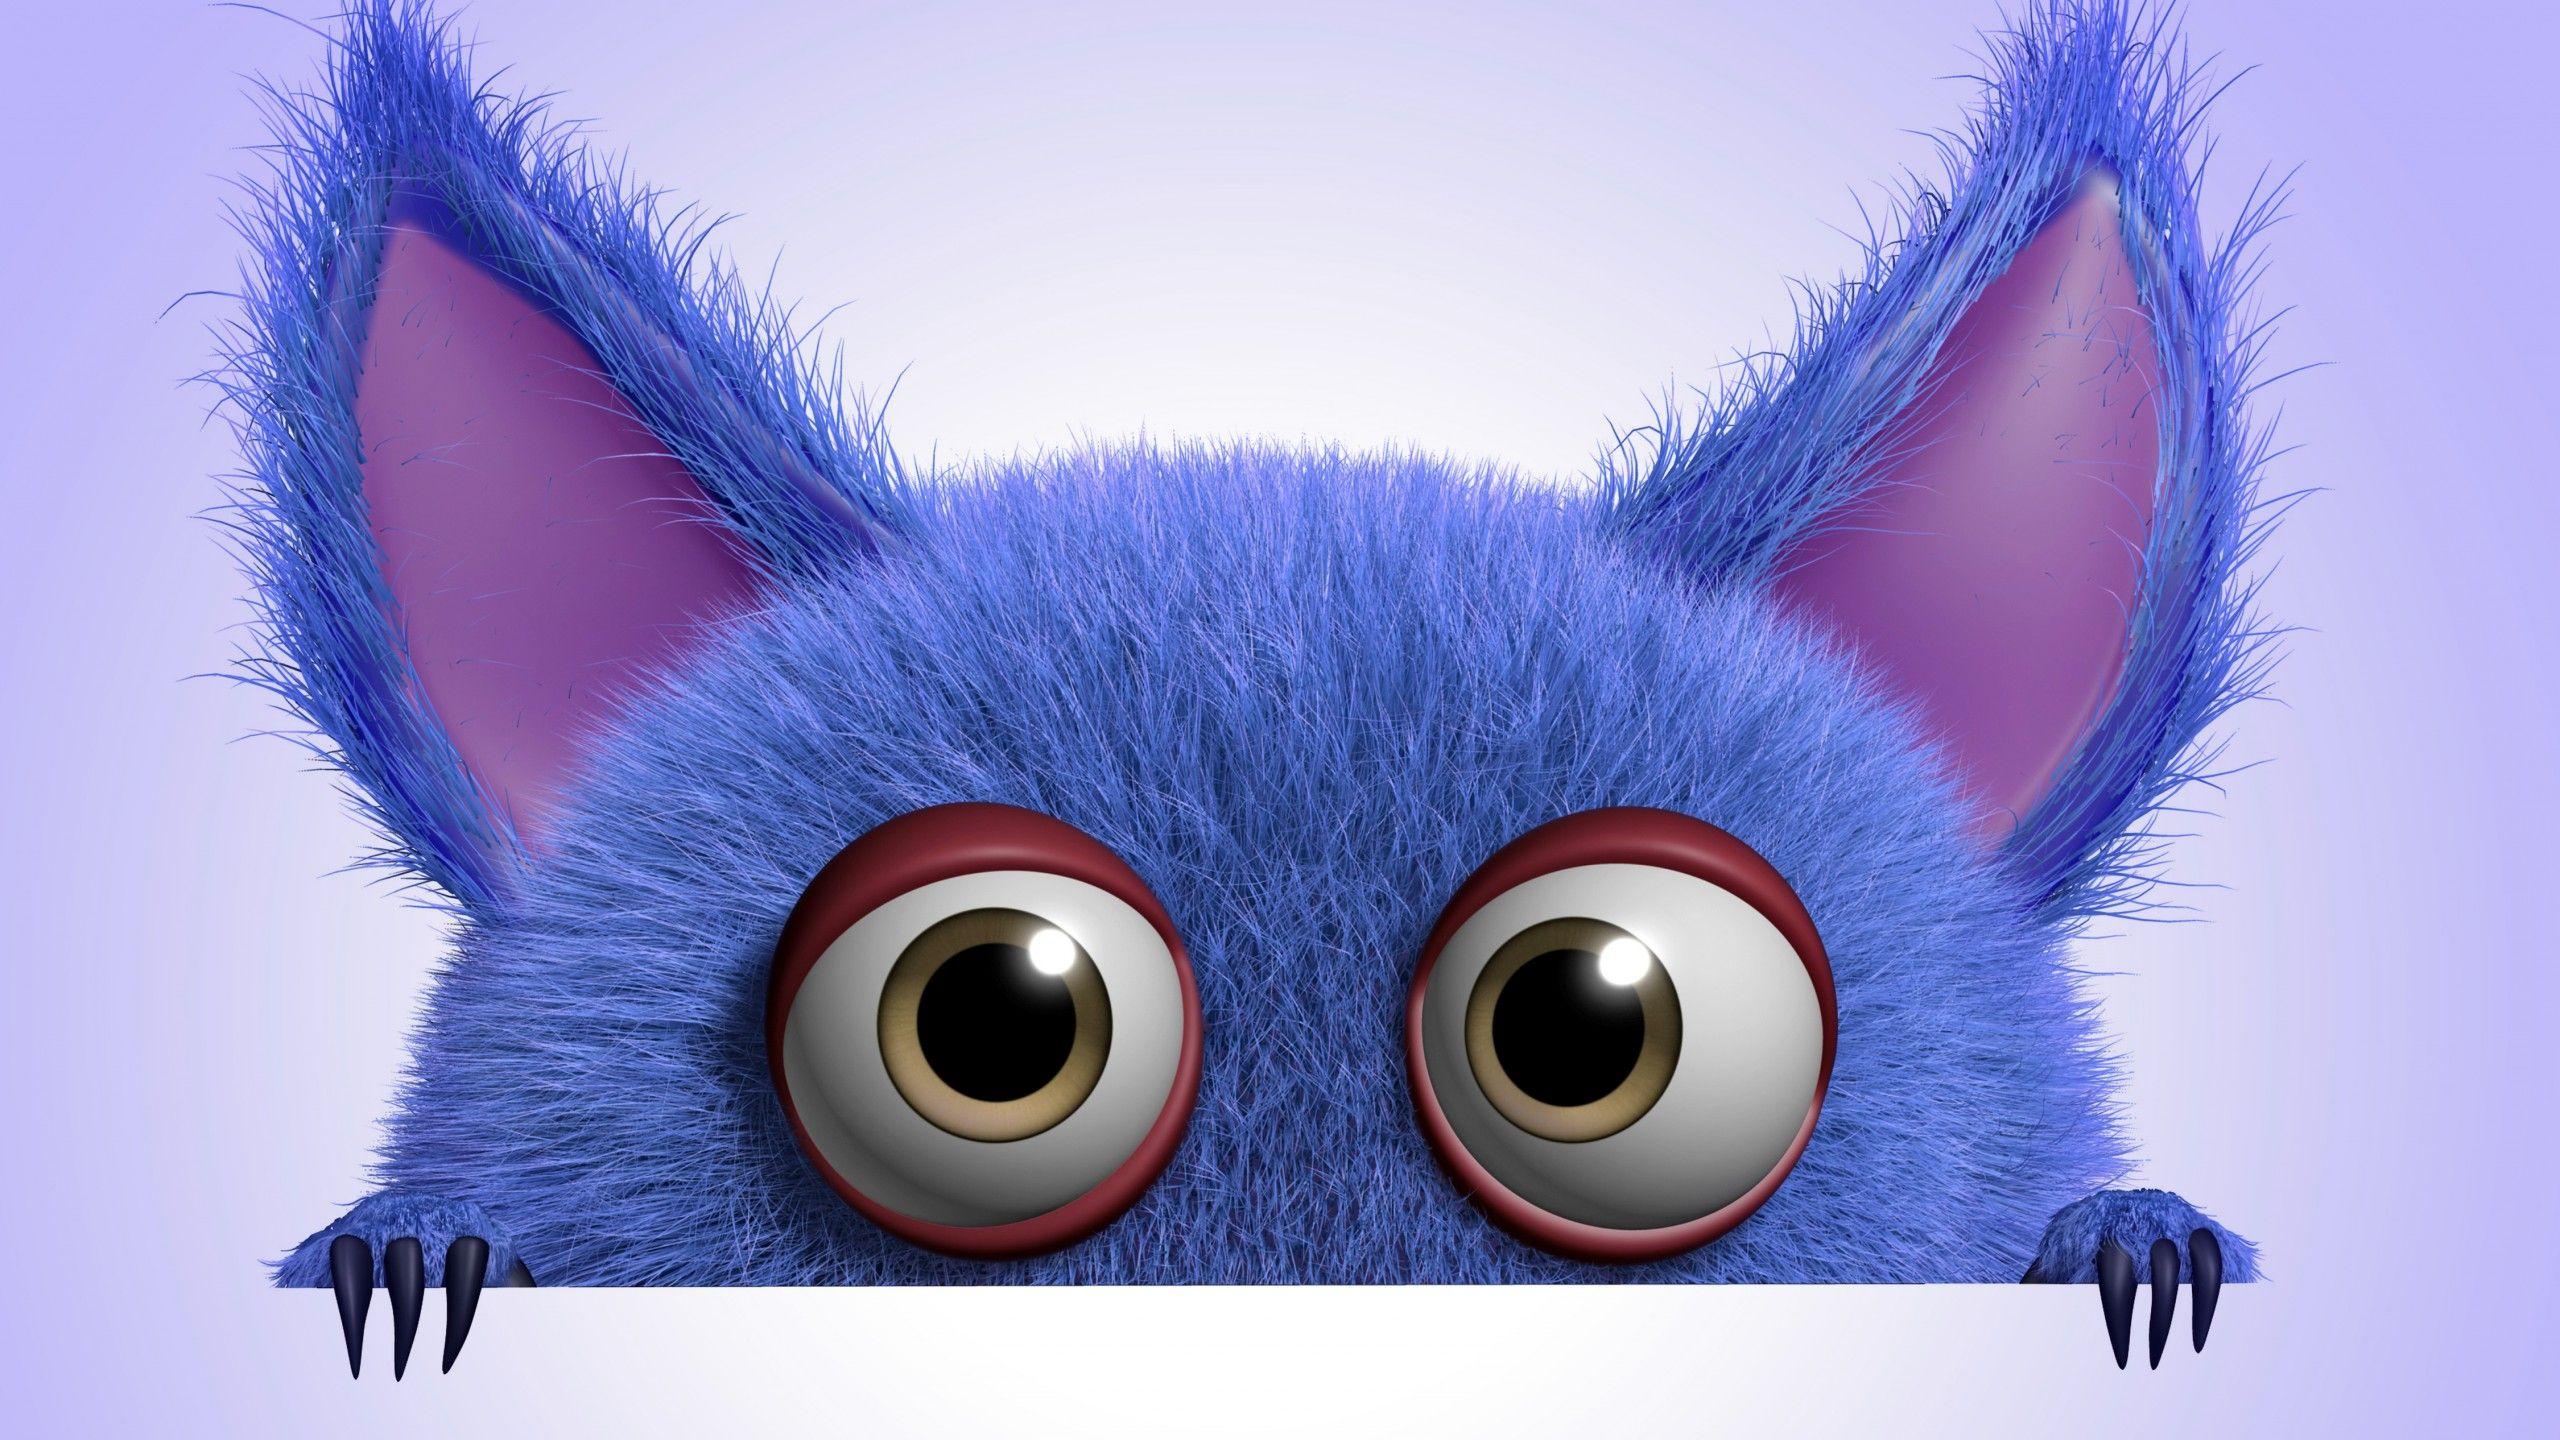 download wallpaper 3d funny monster cartoon cute